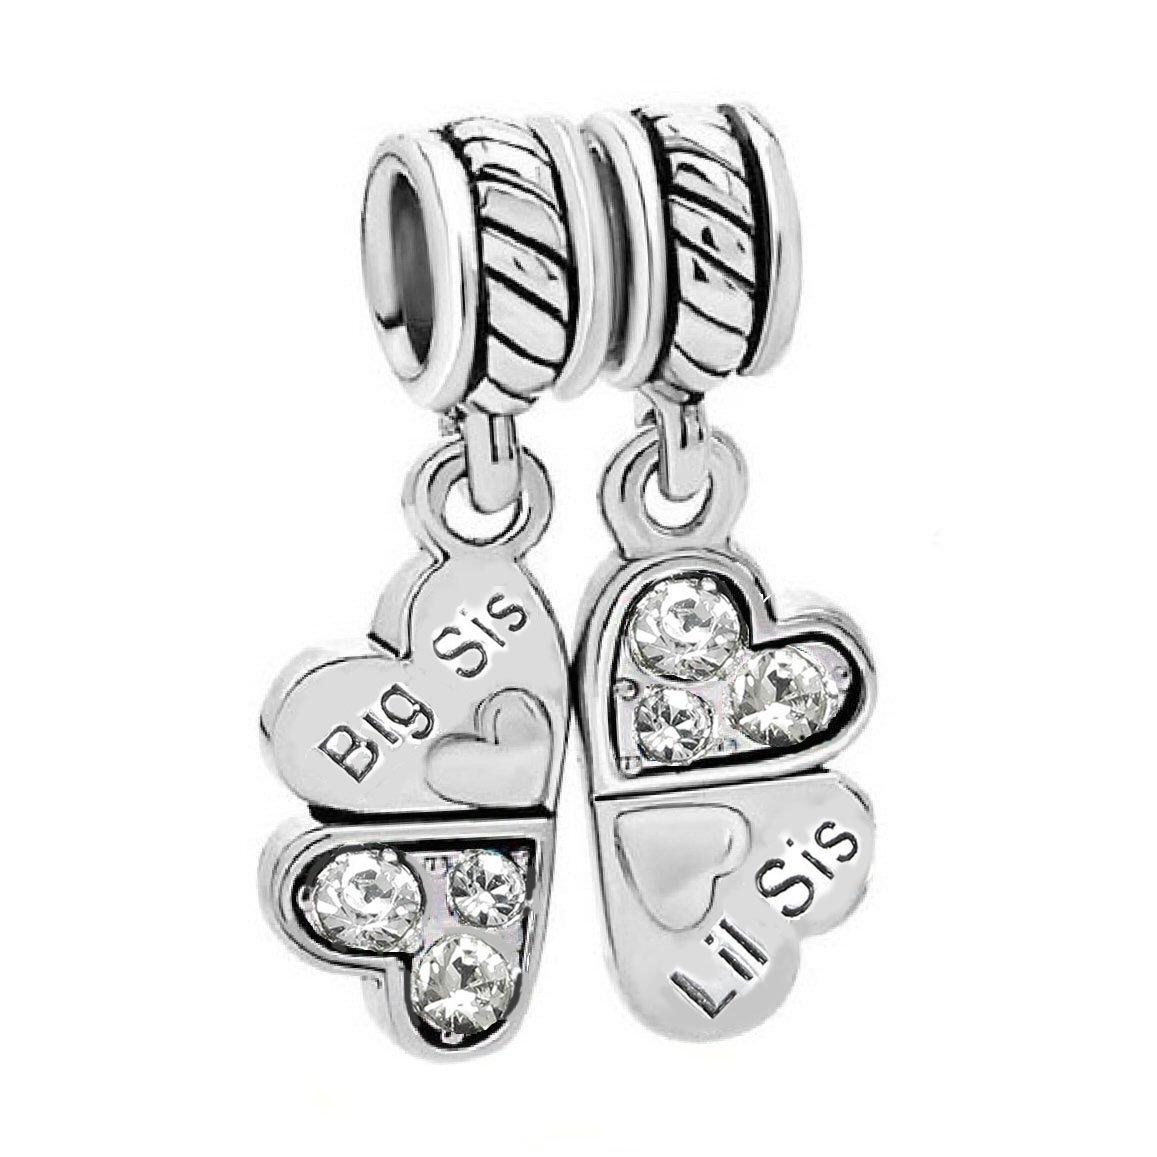 Sterling Silver Rhinestone 'Big Sis Little Sis Love' Heart European Bead Charm